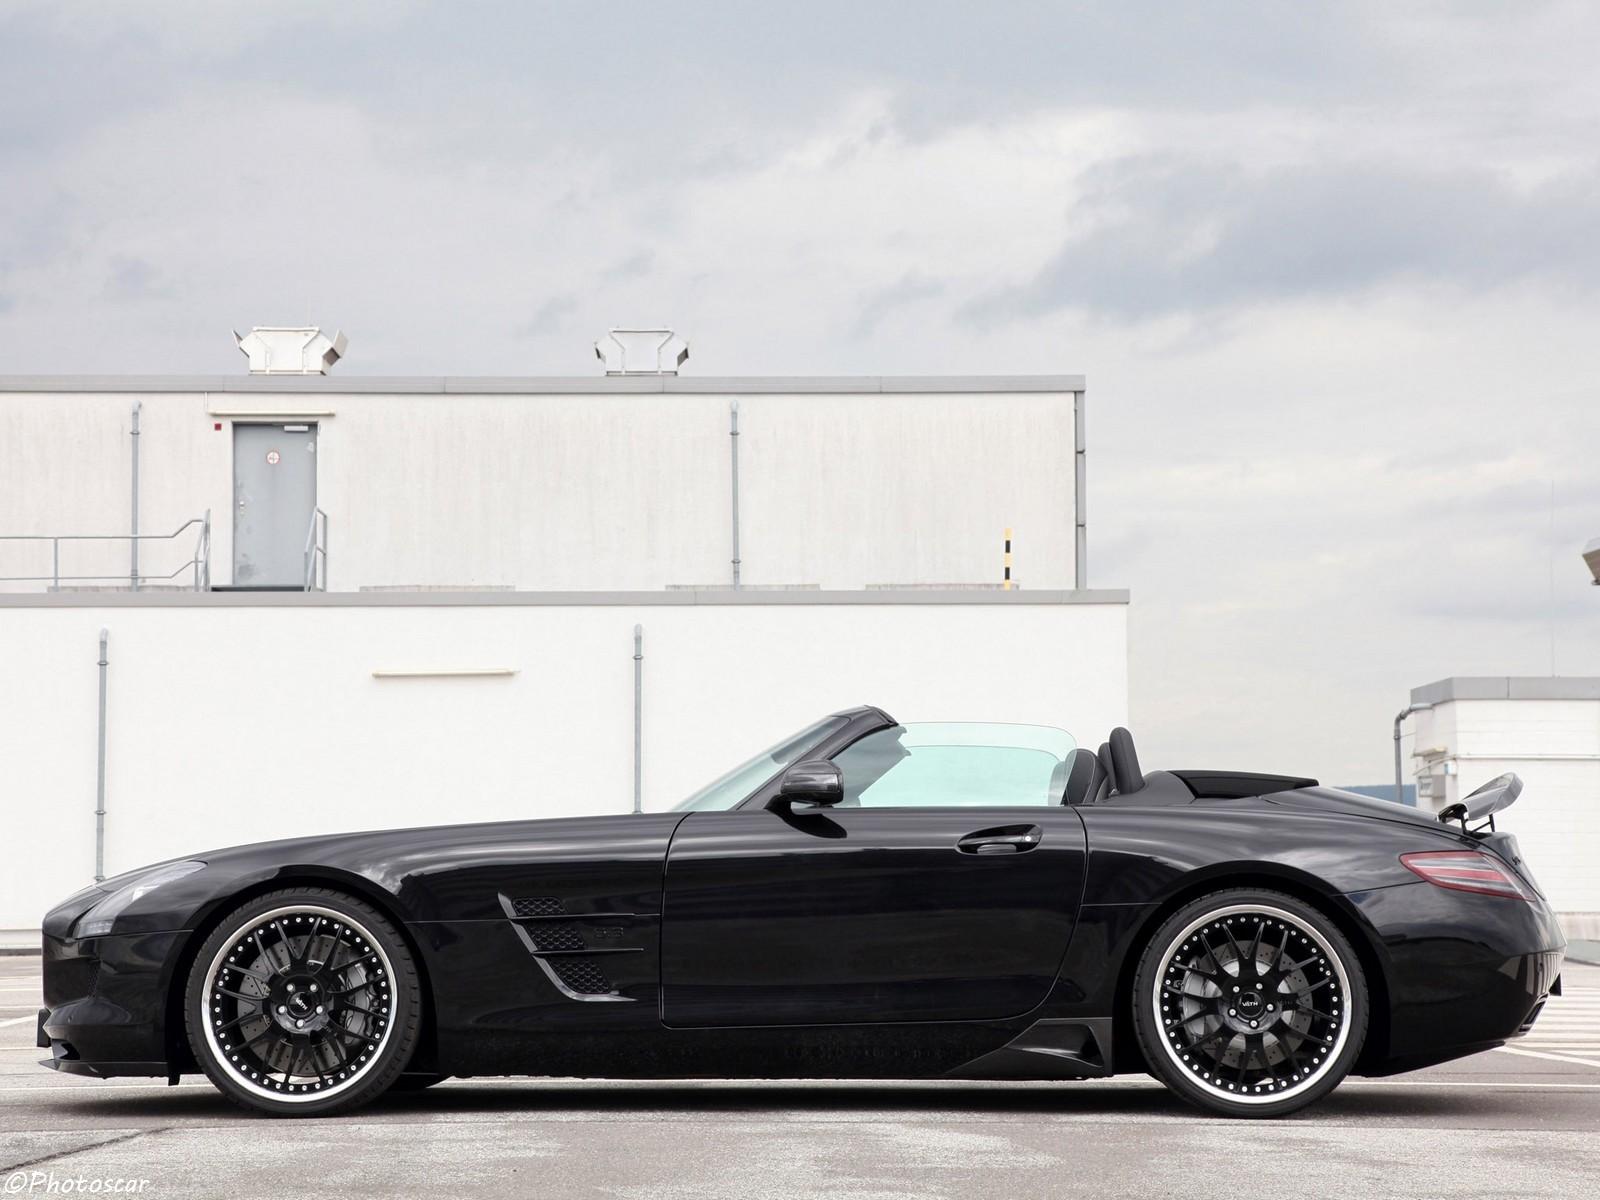 VATH Mercedes-Benz SLS AMG Roadster with 515kW